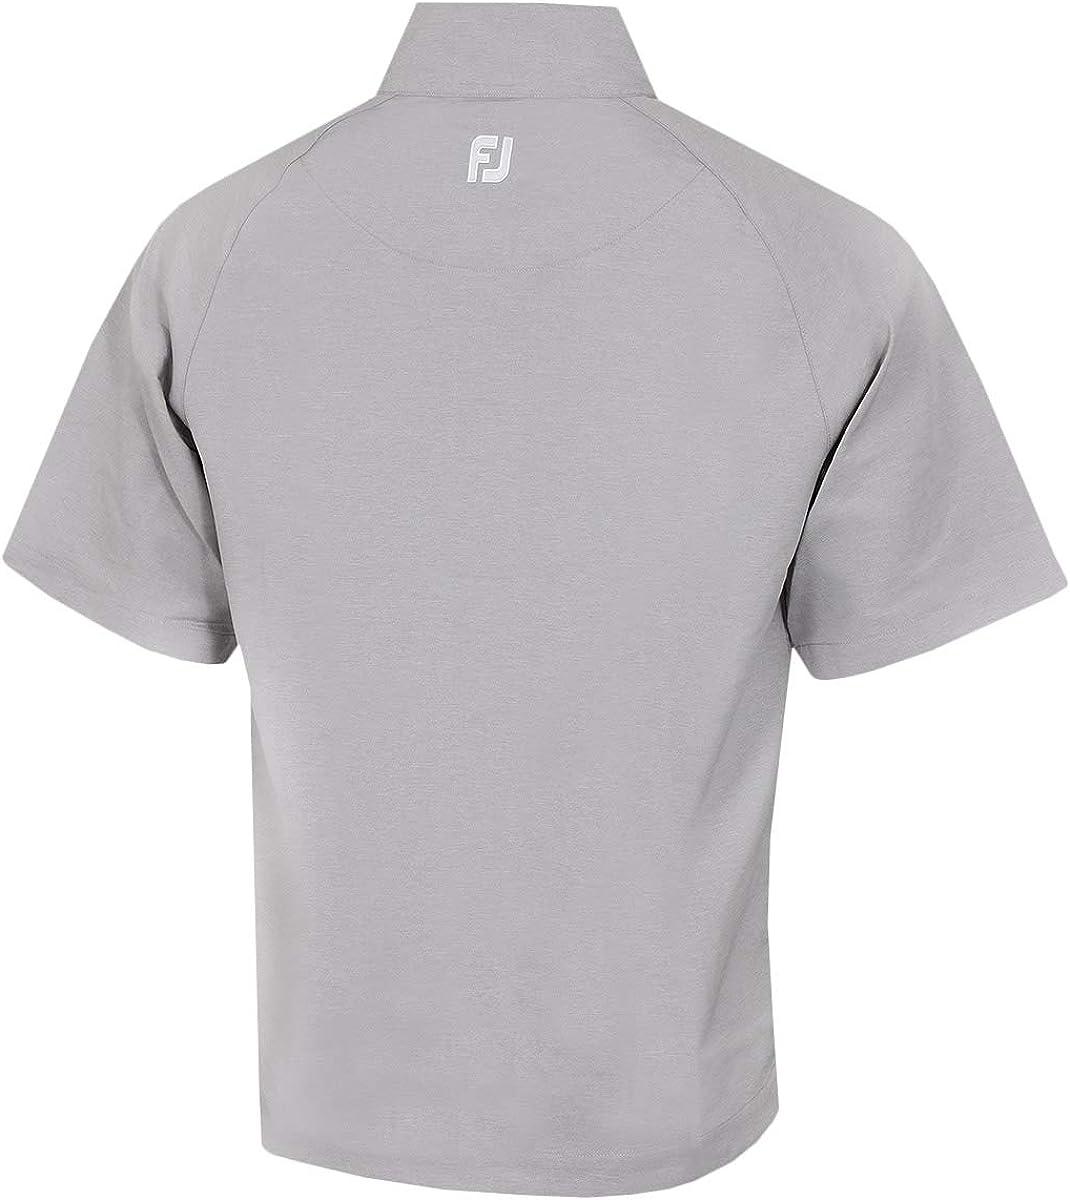 Footjoy Men's Fj Performace Half - Zip Short Sleeve T-Shirt Multi-coloured (Grey / White)